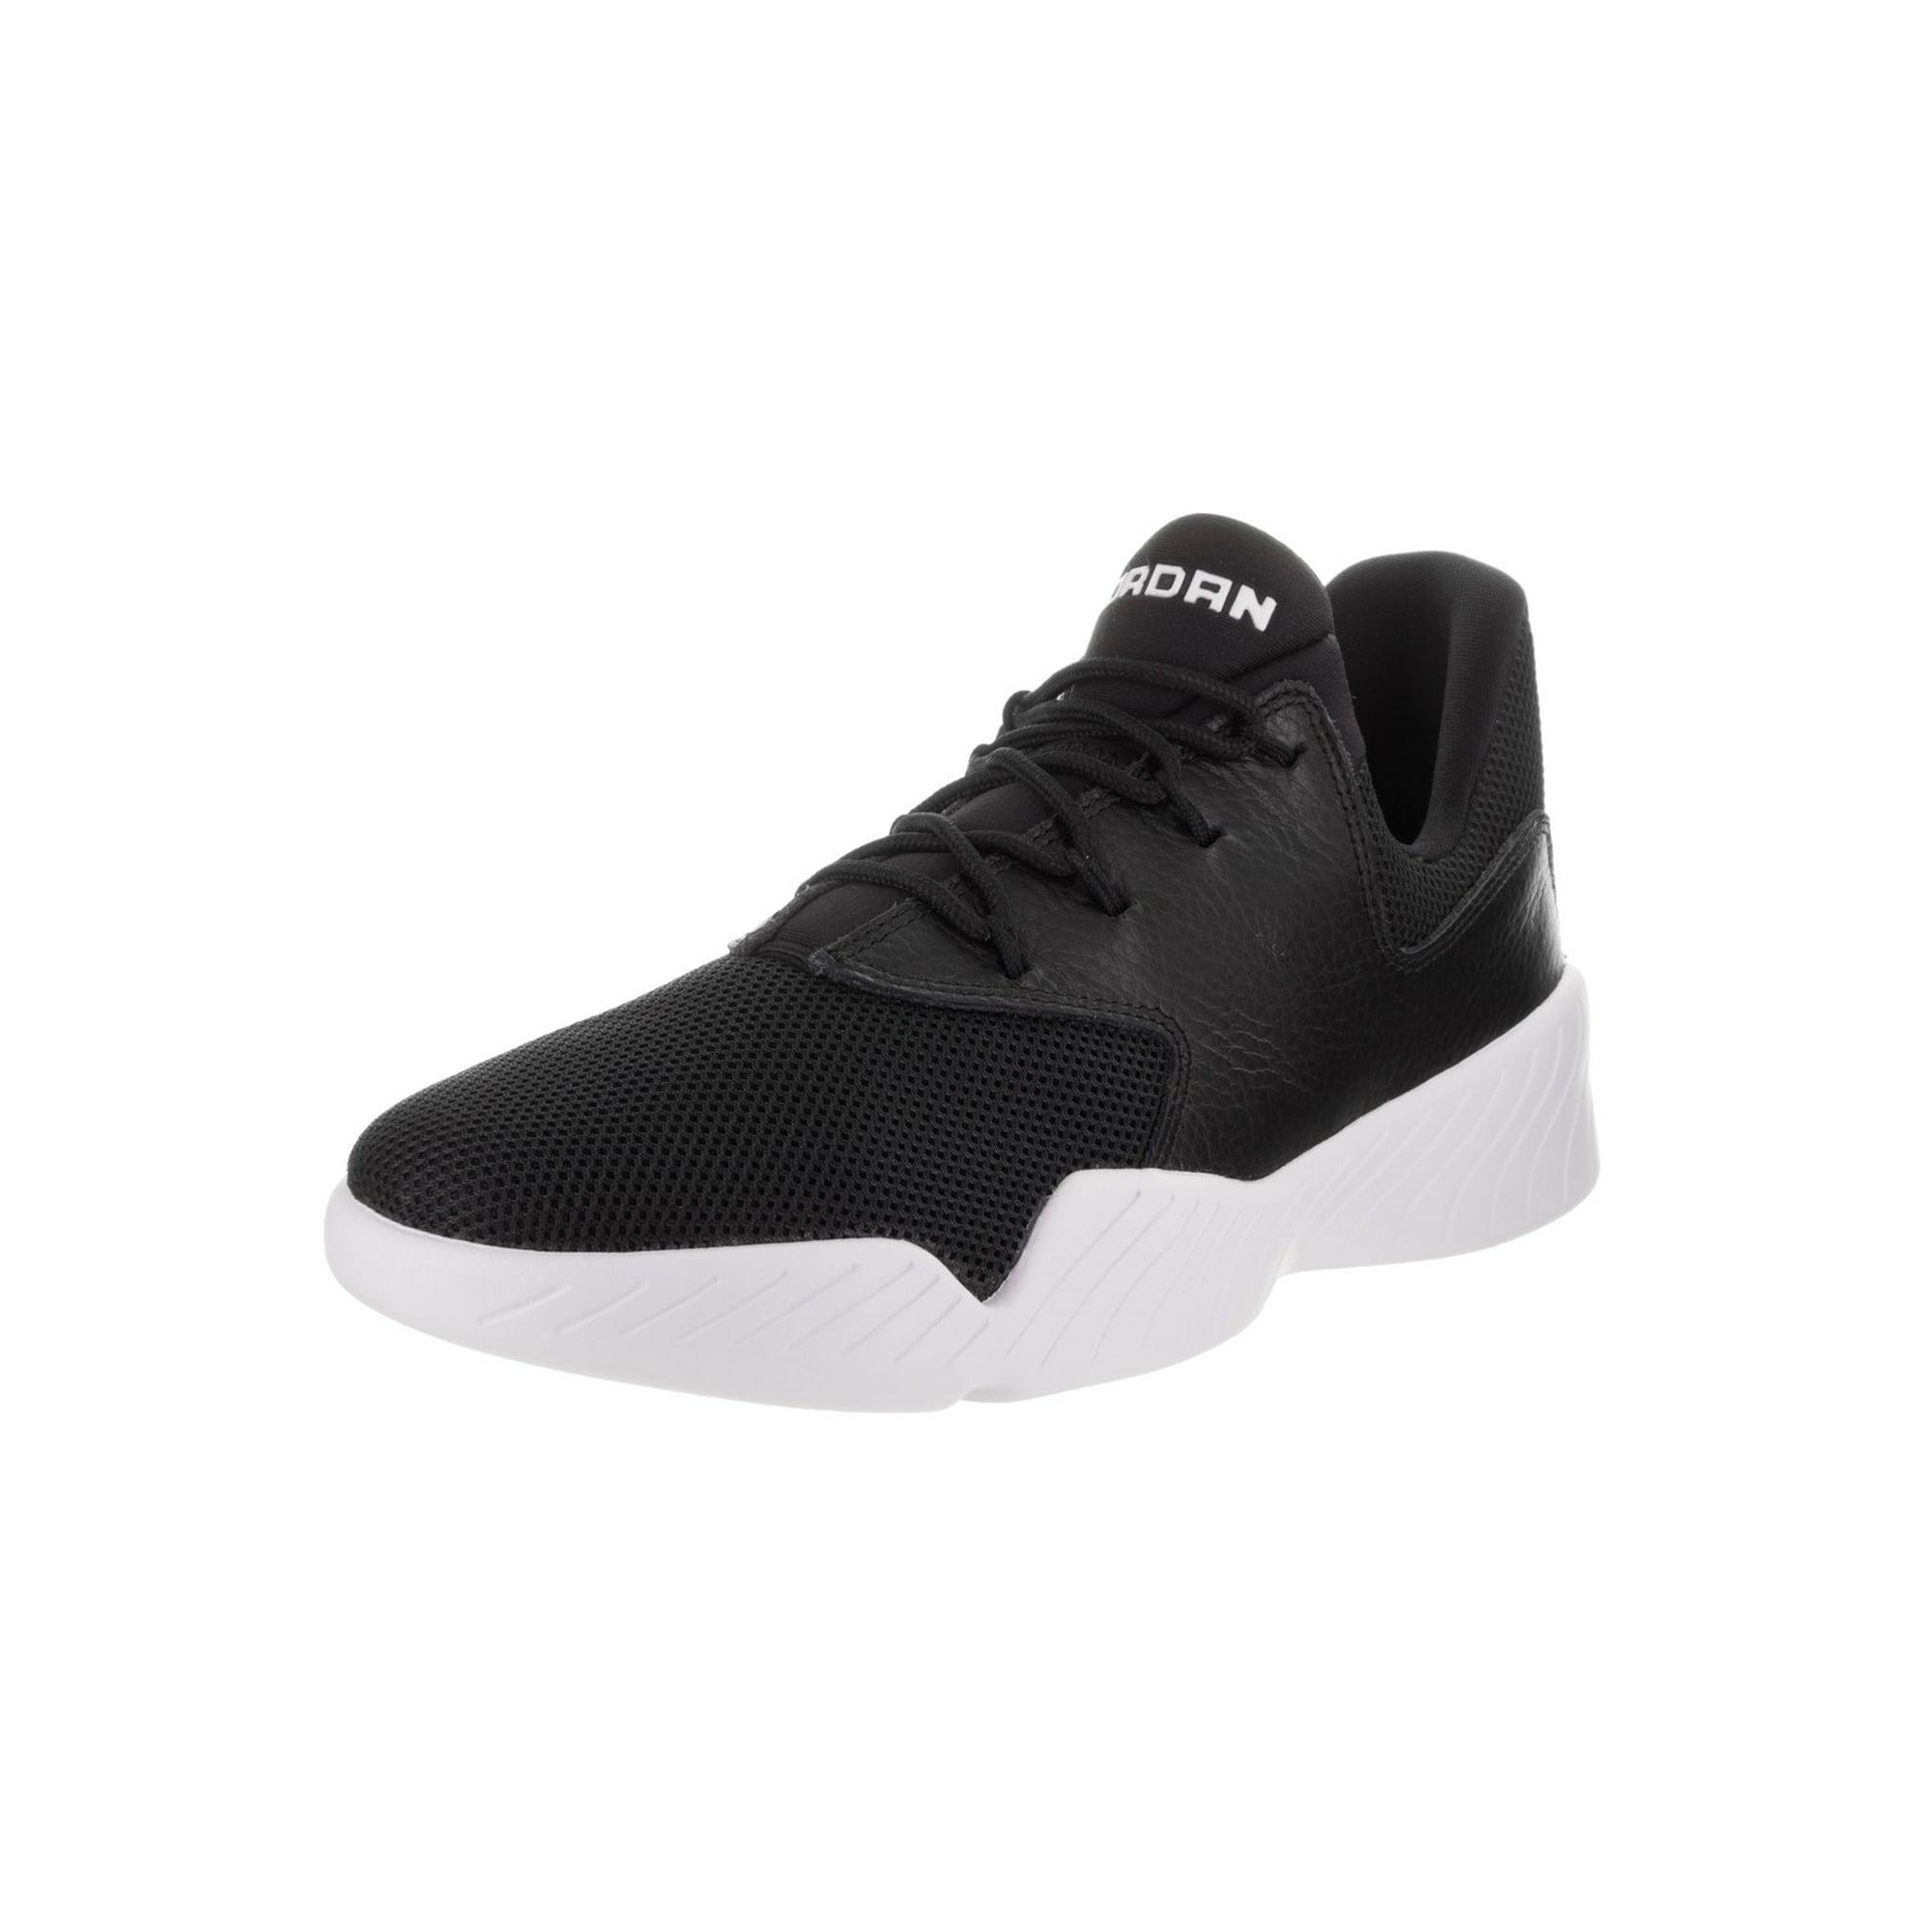 ad18e025d04 Nike Jordan Men's Jordan J23 Low Basketball Shoe | Walmart Canada